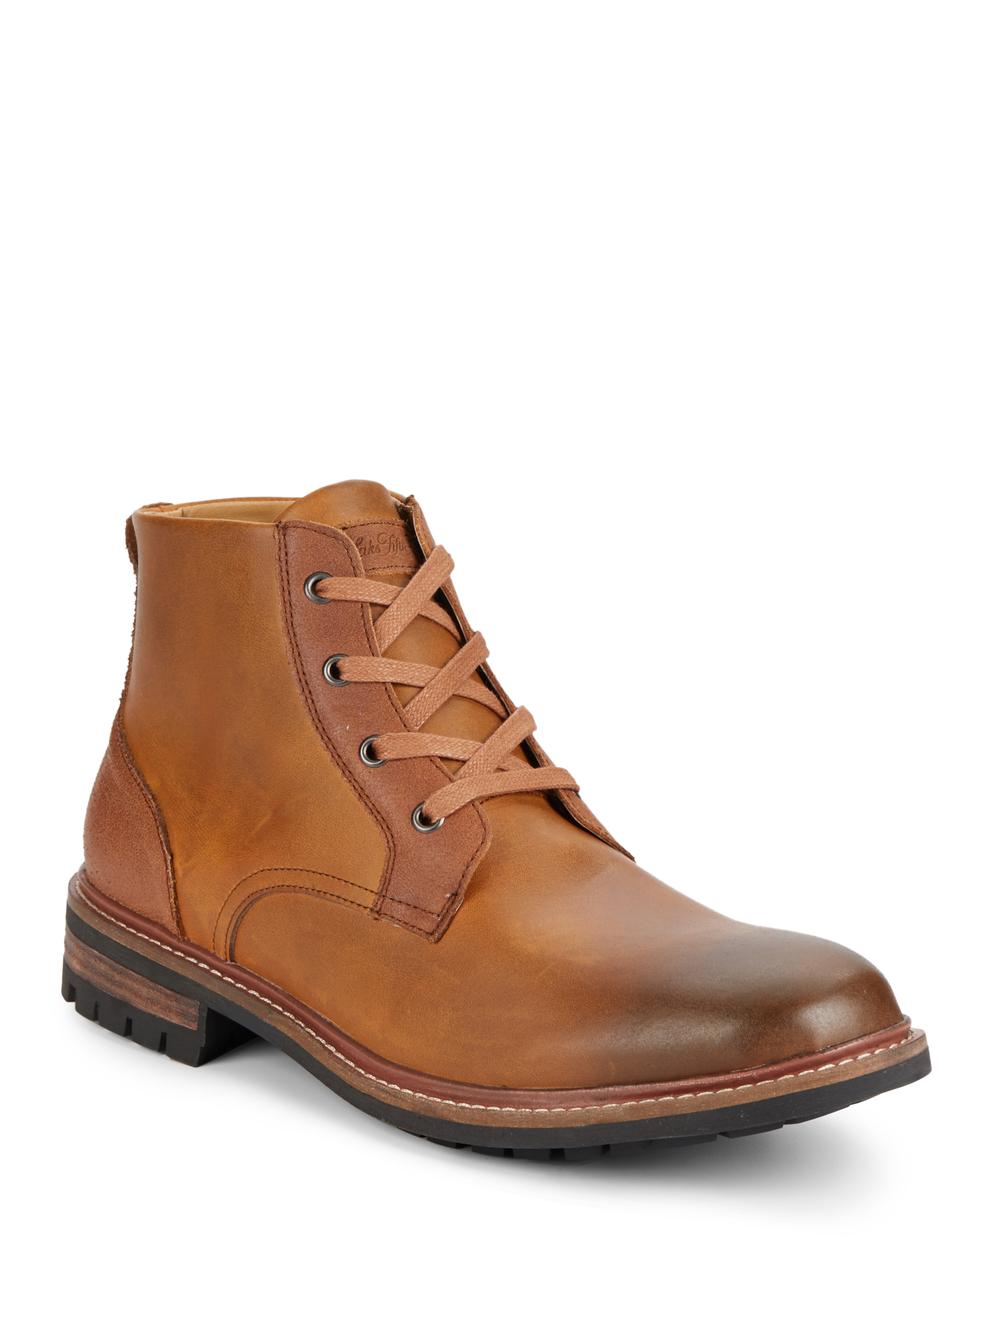 Shoes-023.JPG